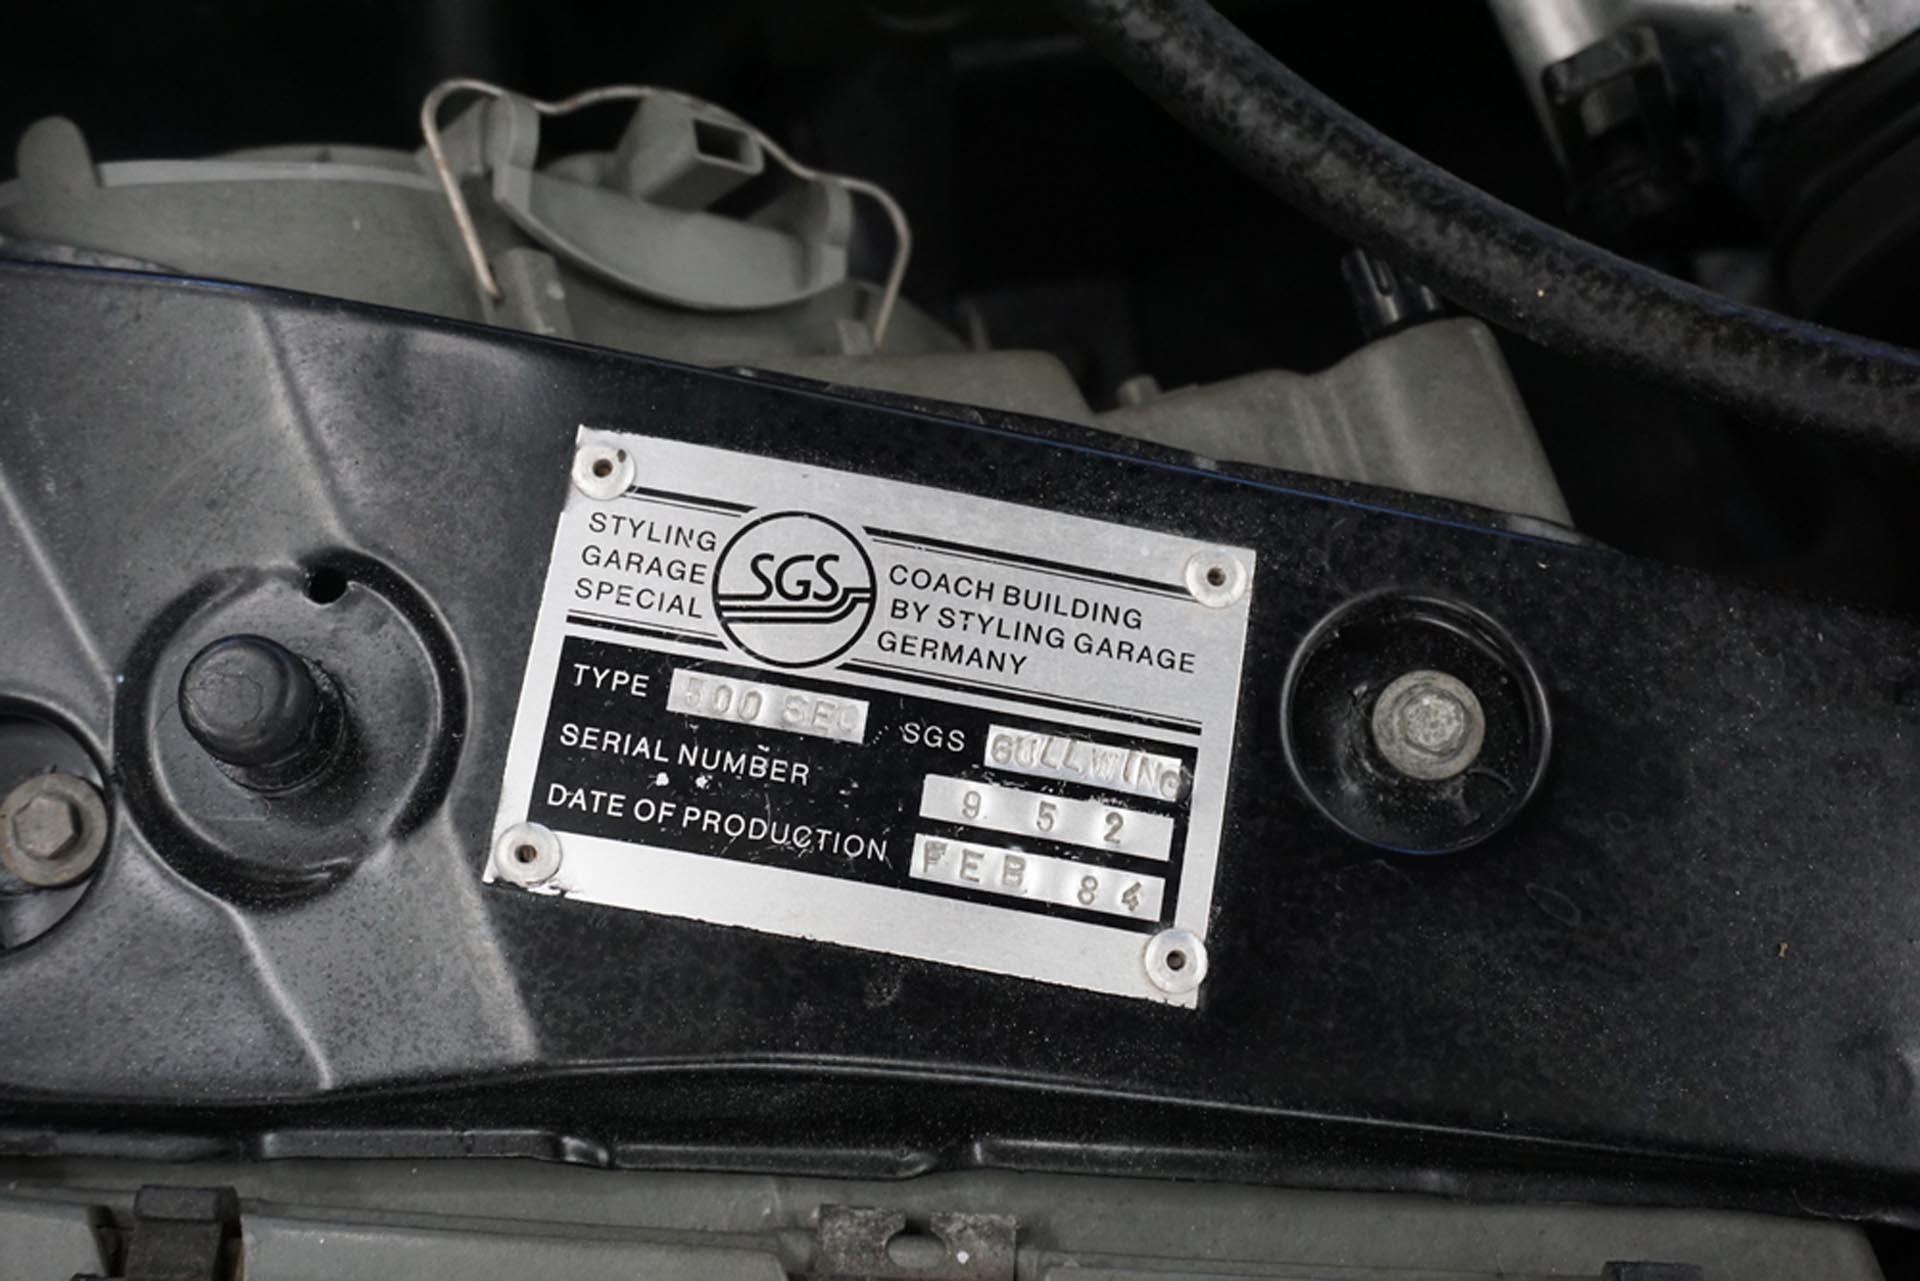 Styling Garage SEC1000 Gullwing Vin Plate